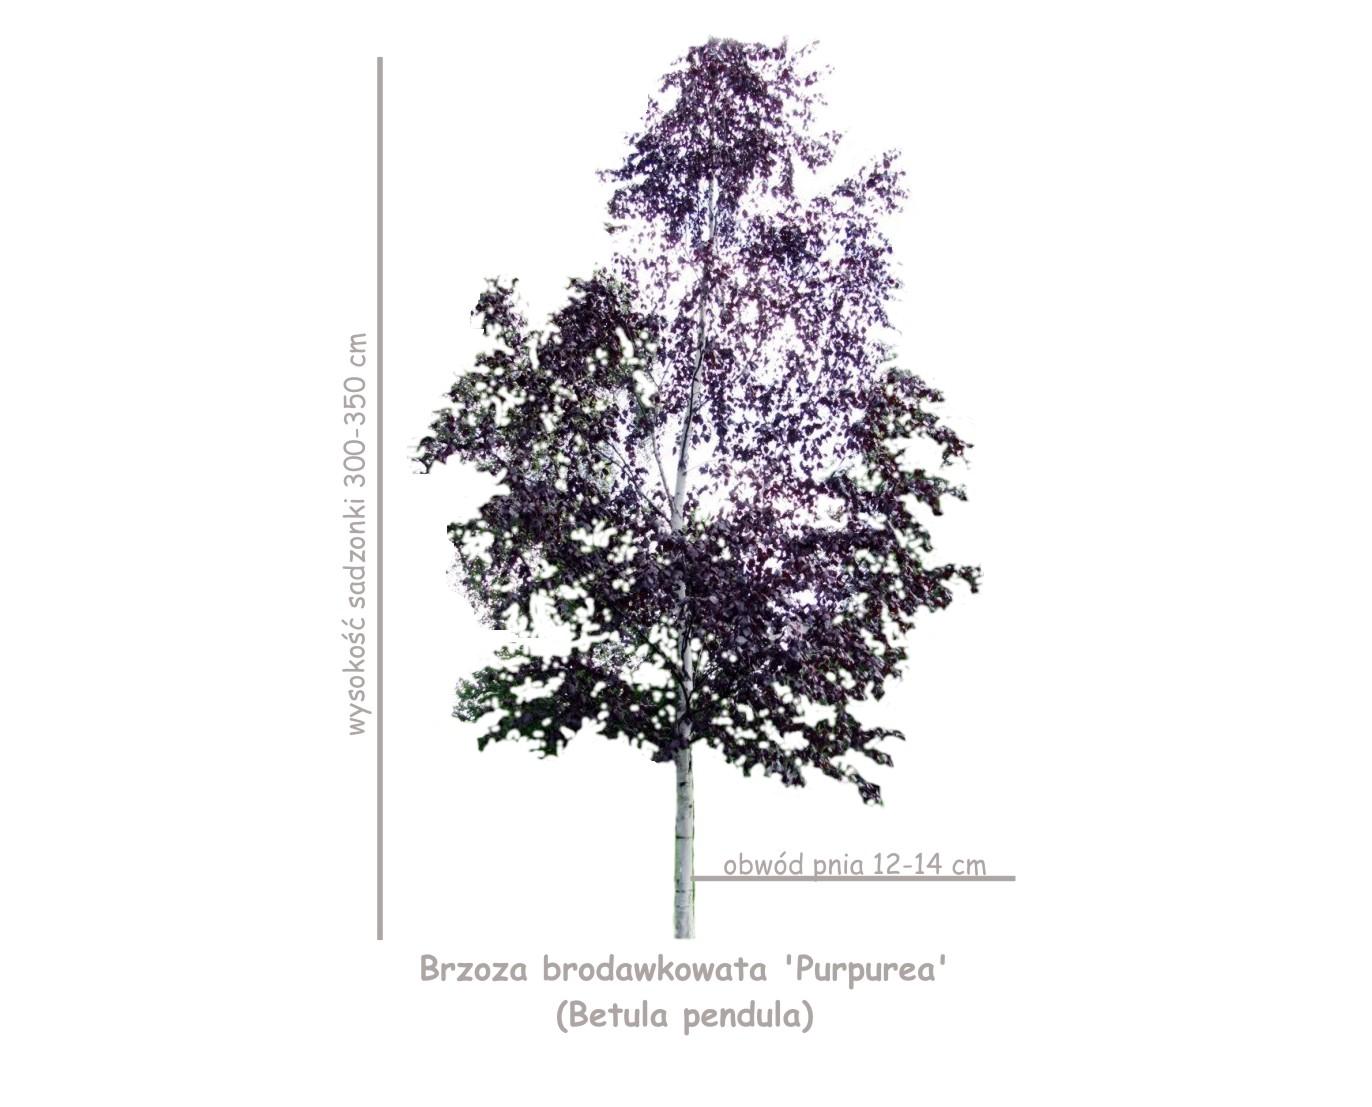 Brzoza brodawkowata 'Purpurea' (Betula pendula) obwód pnia 12-14 cm.